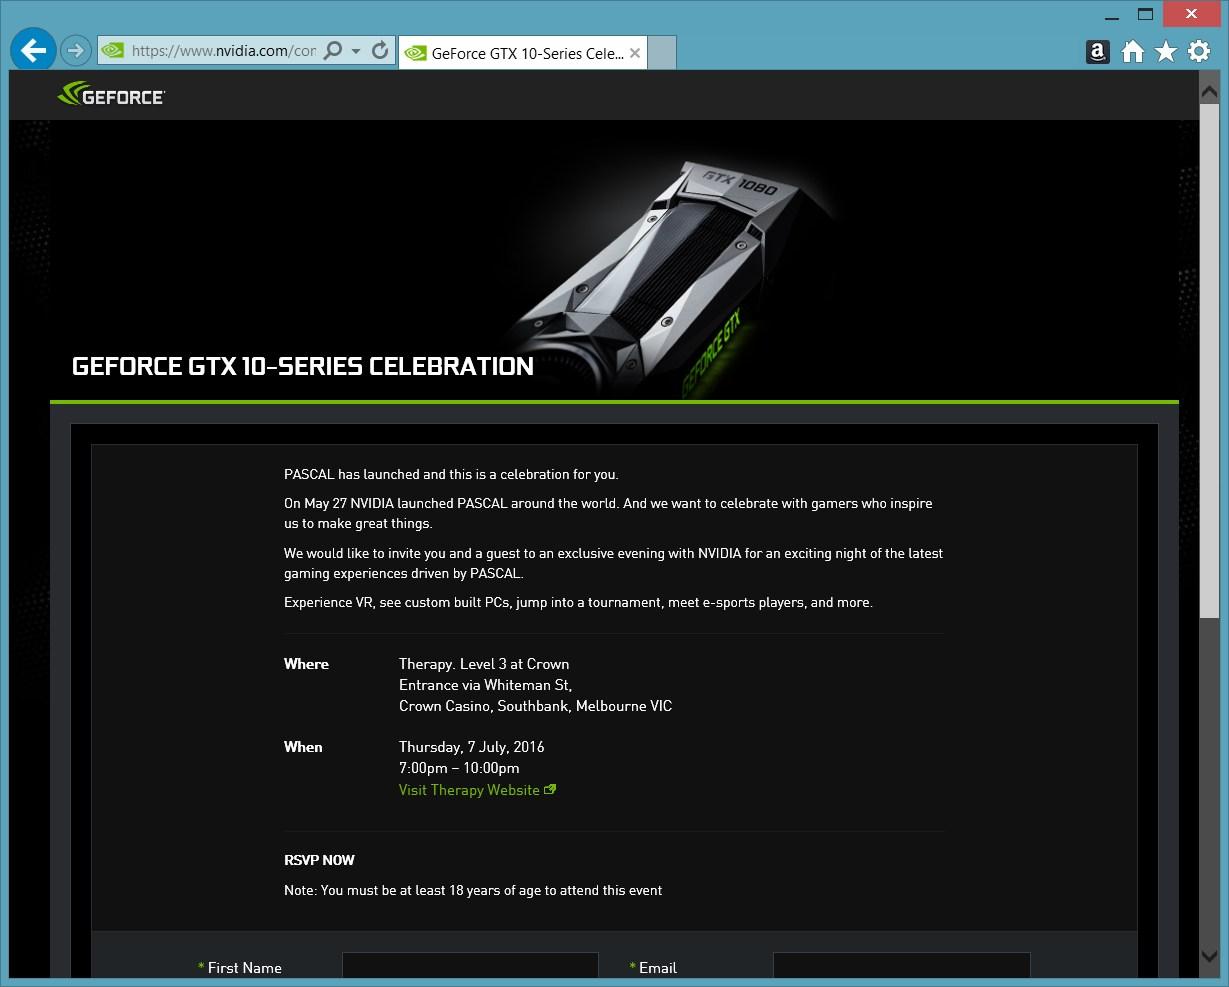 Nvidia-Einladung